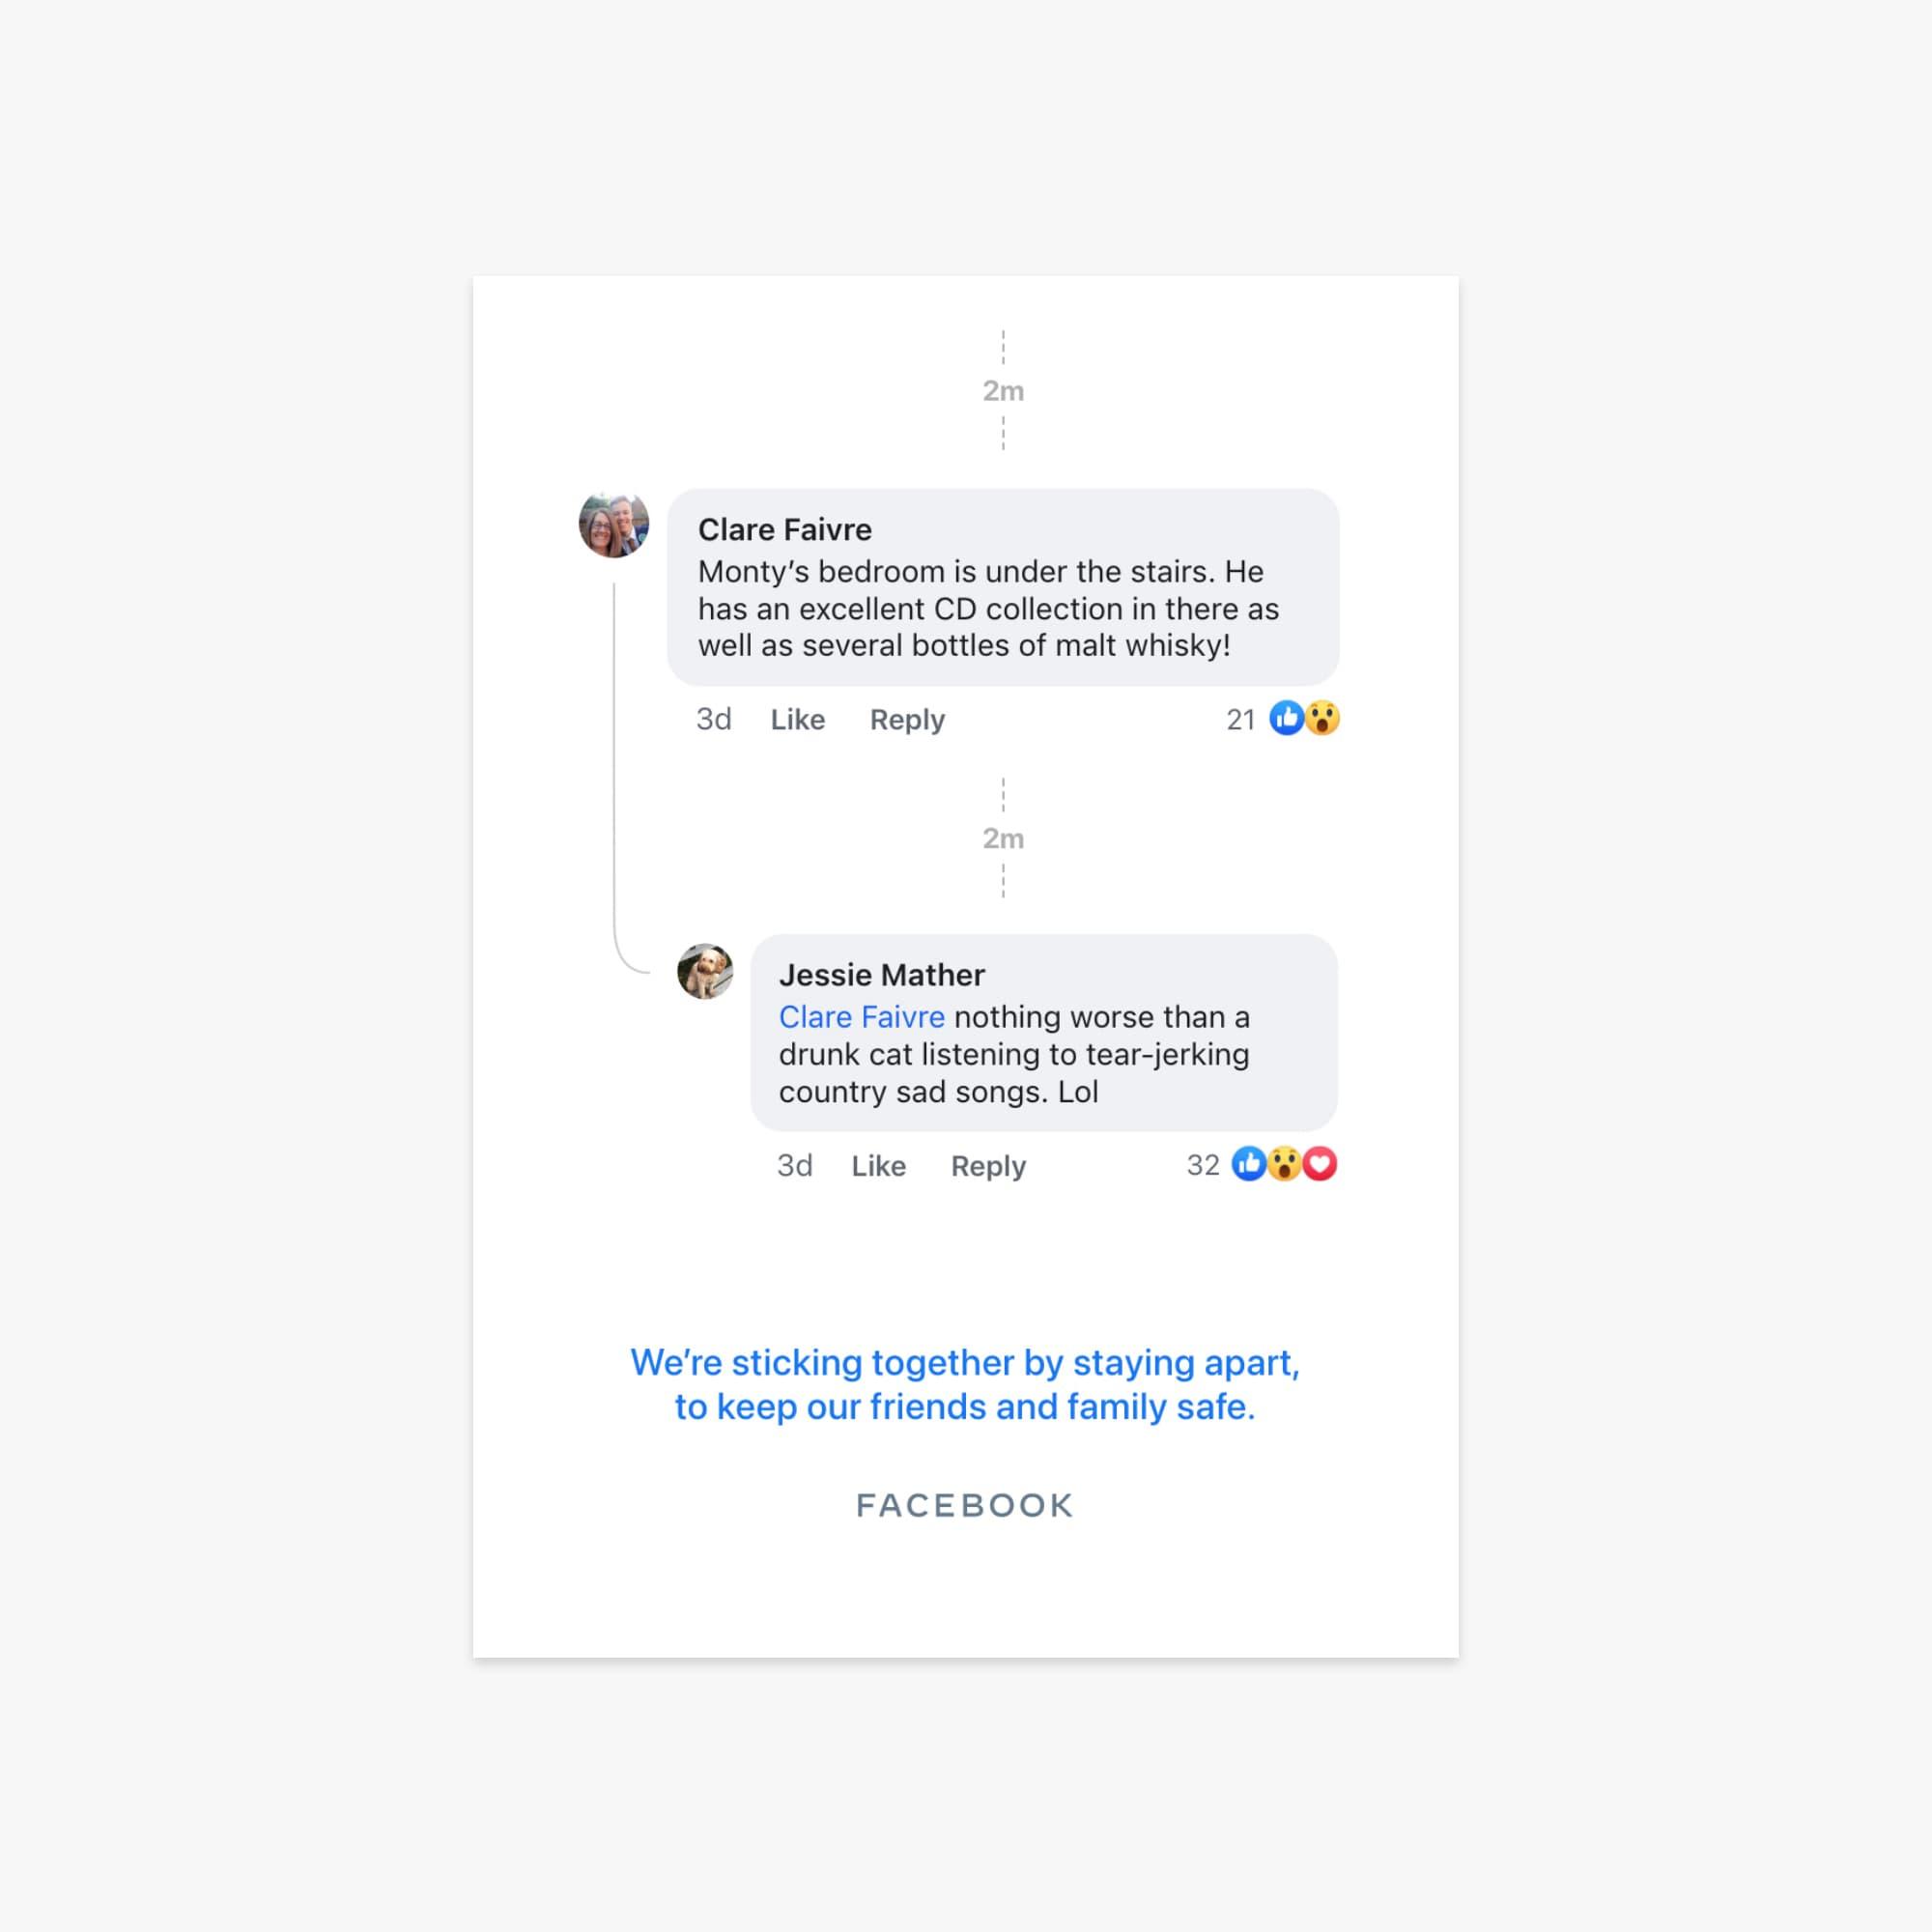 amy-jones-facebook-spacebook-social-distancing-2